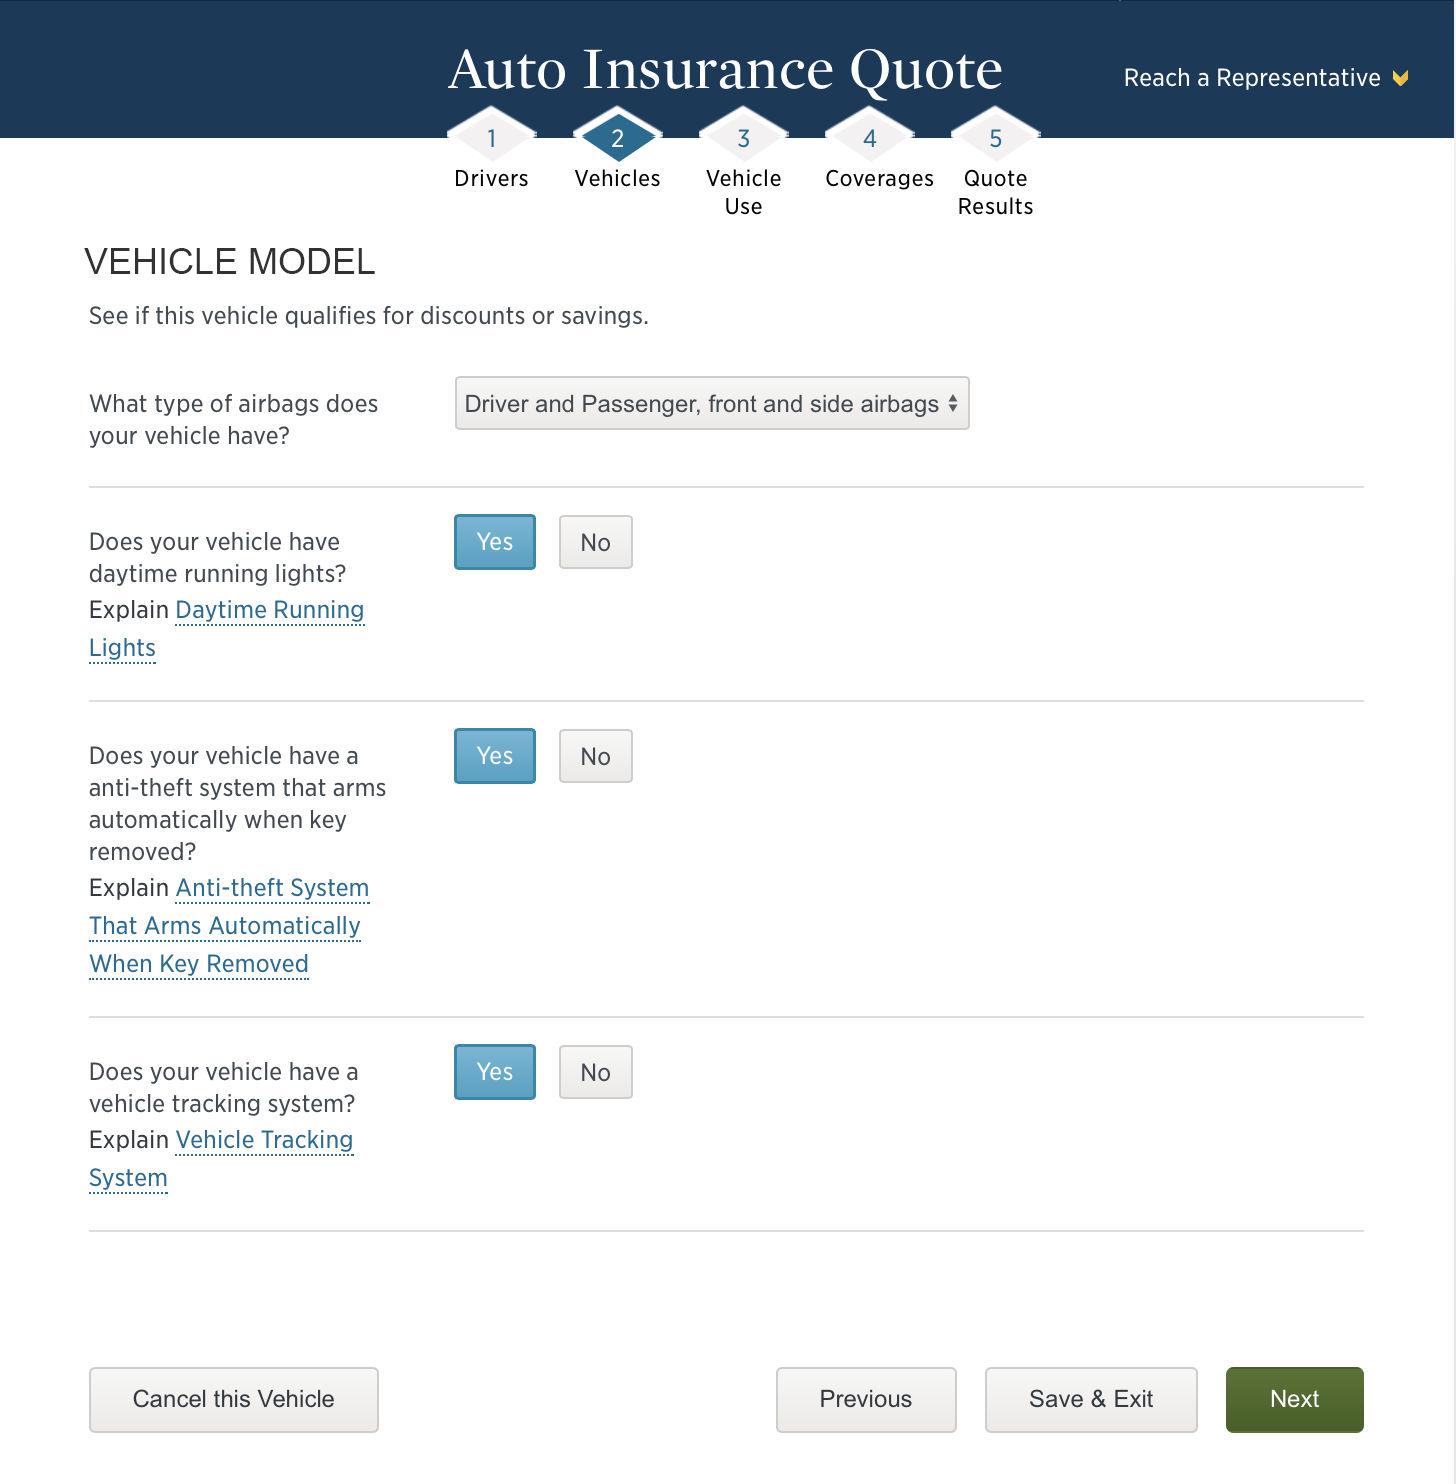 USAA vehicle model information